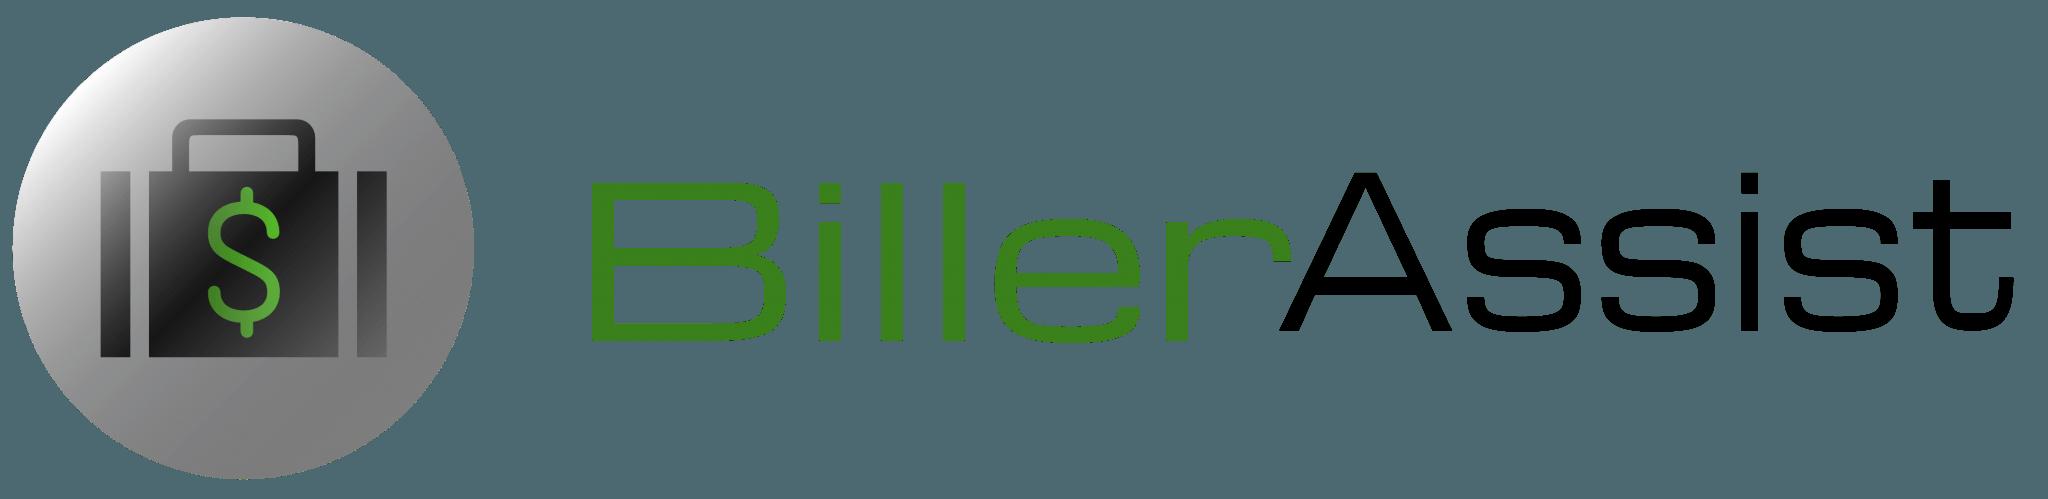 BillerAssist Support | Online Legal Billing Software & Law Firm Automation